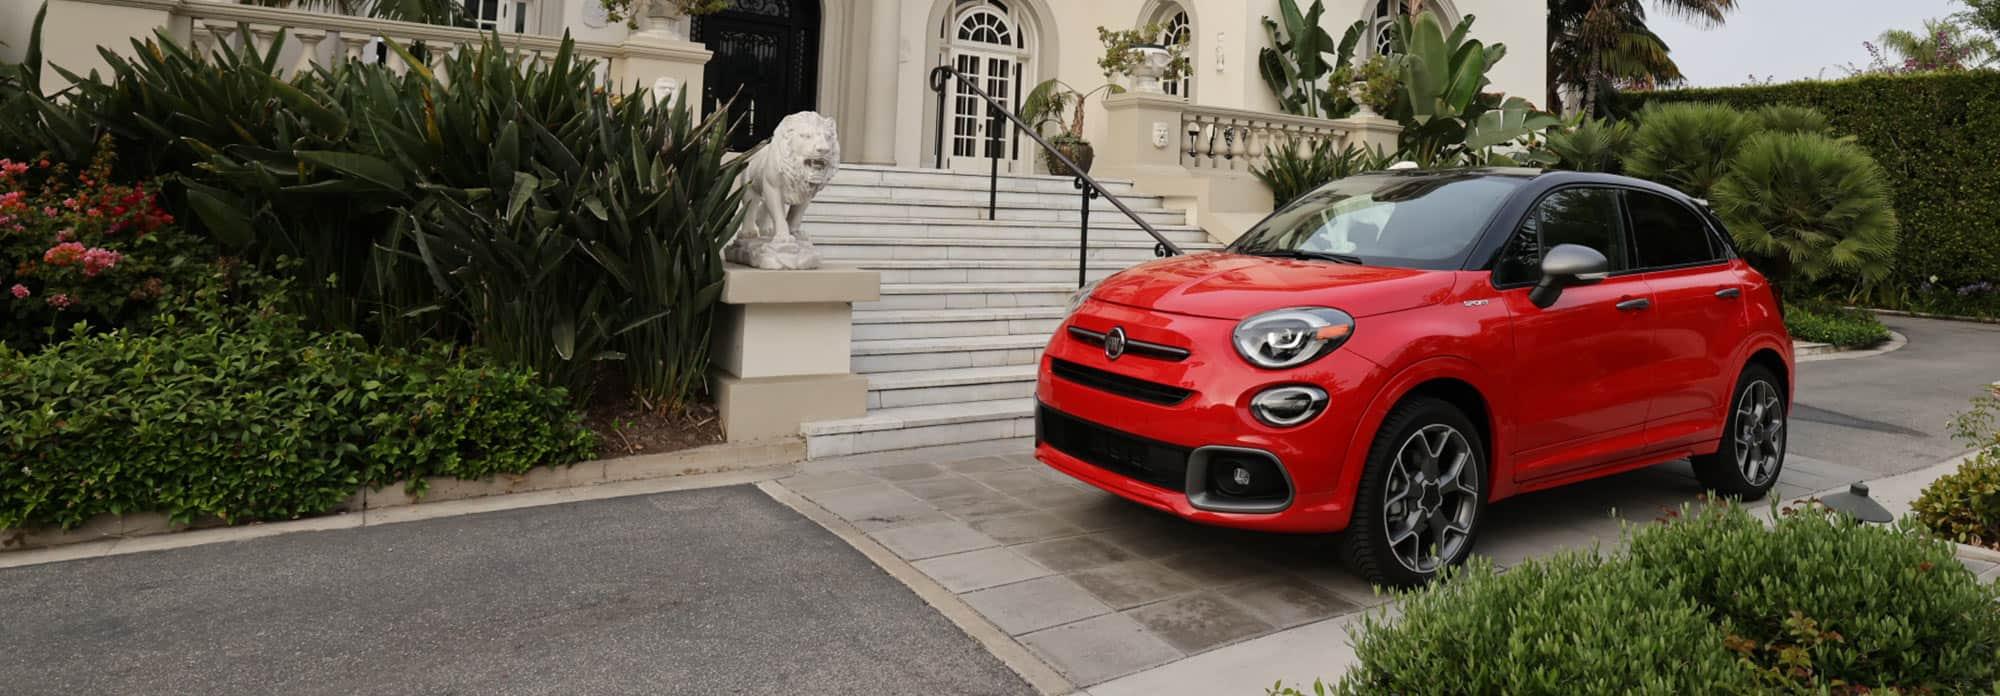 Vista delantera de medio perfil del FIAT 500X Sport 2021 rojo estacionado junto a una casa opulenta.